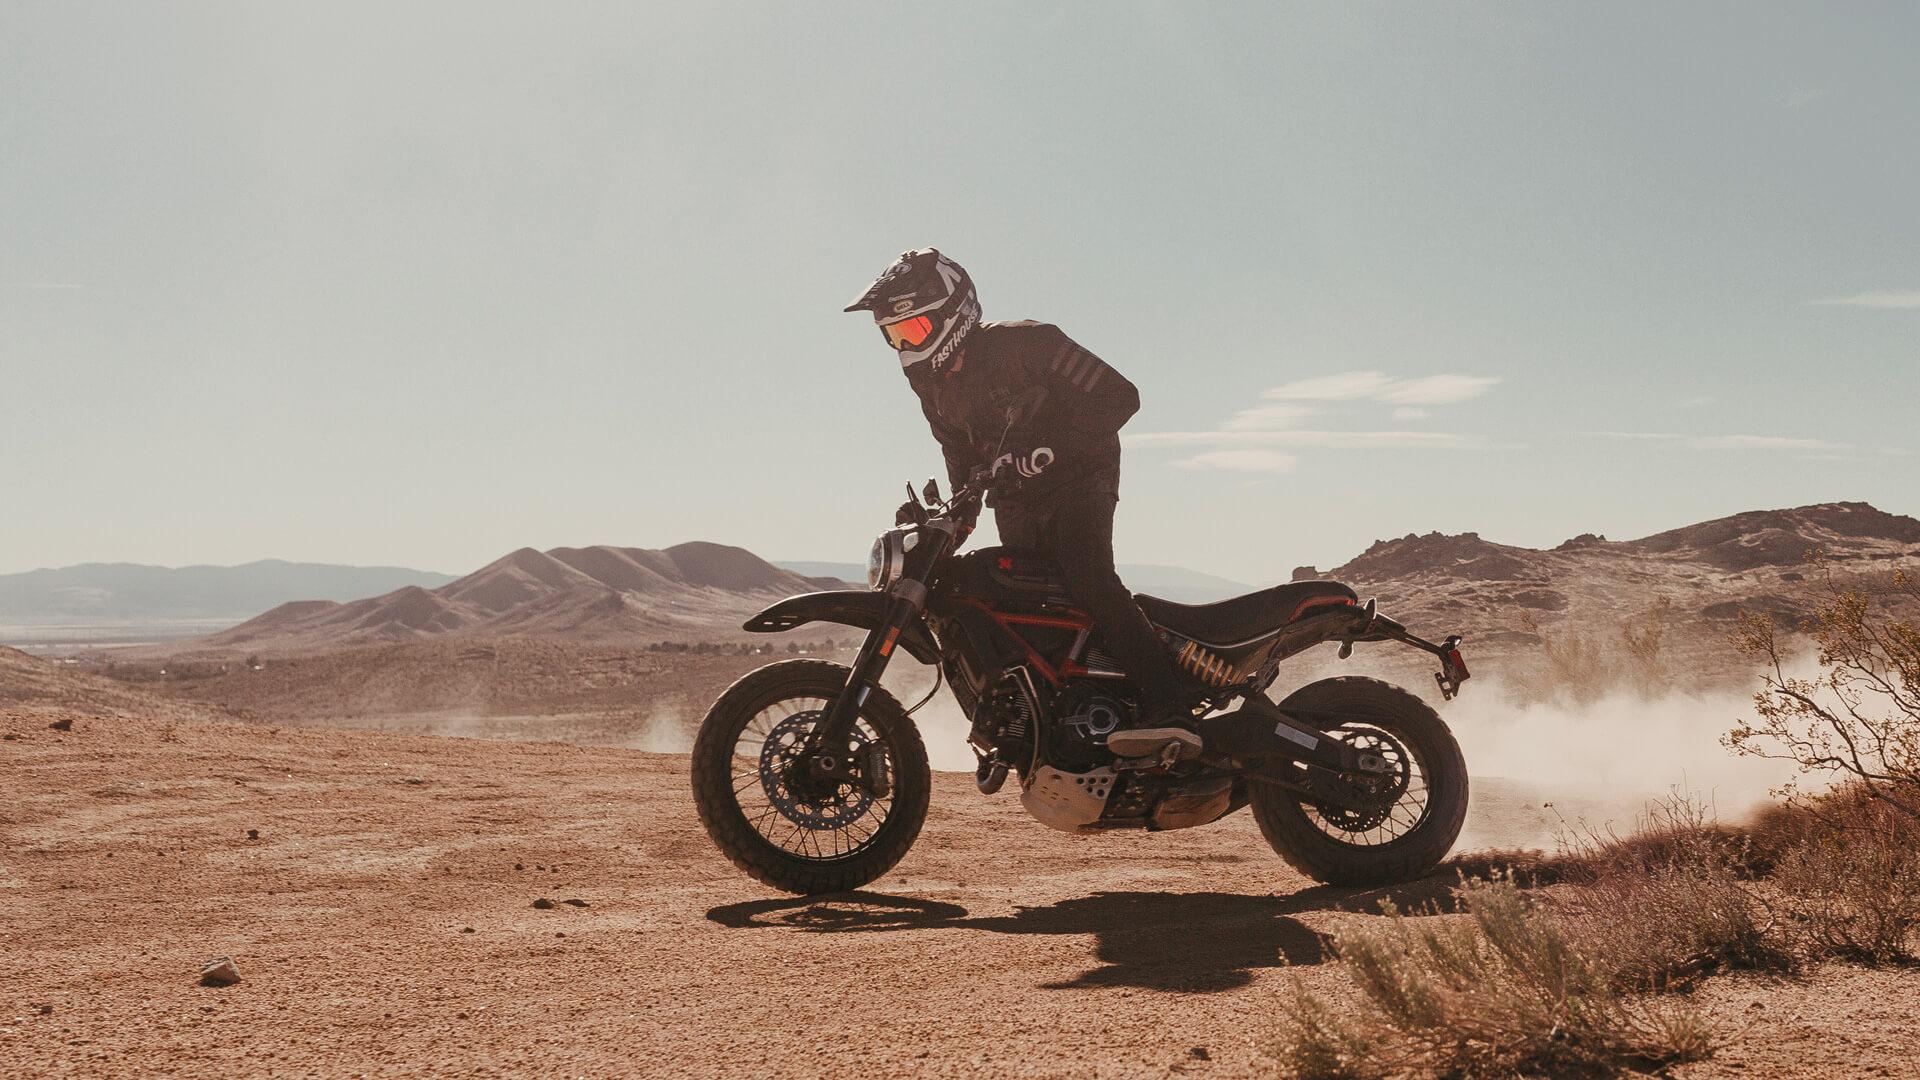 Ducati Scrambler Fasthouse Special Edition in Desert